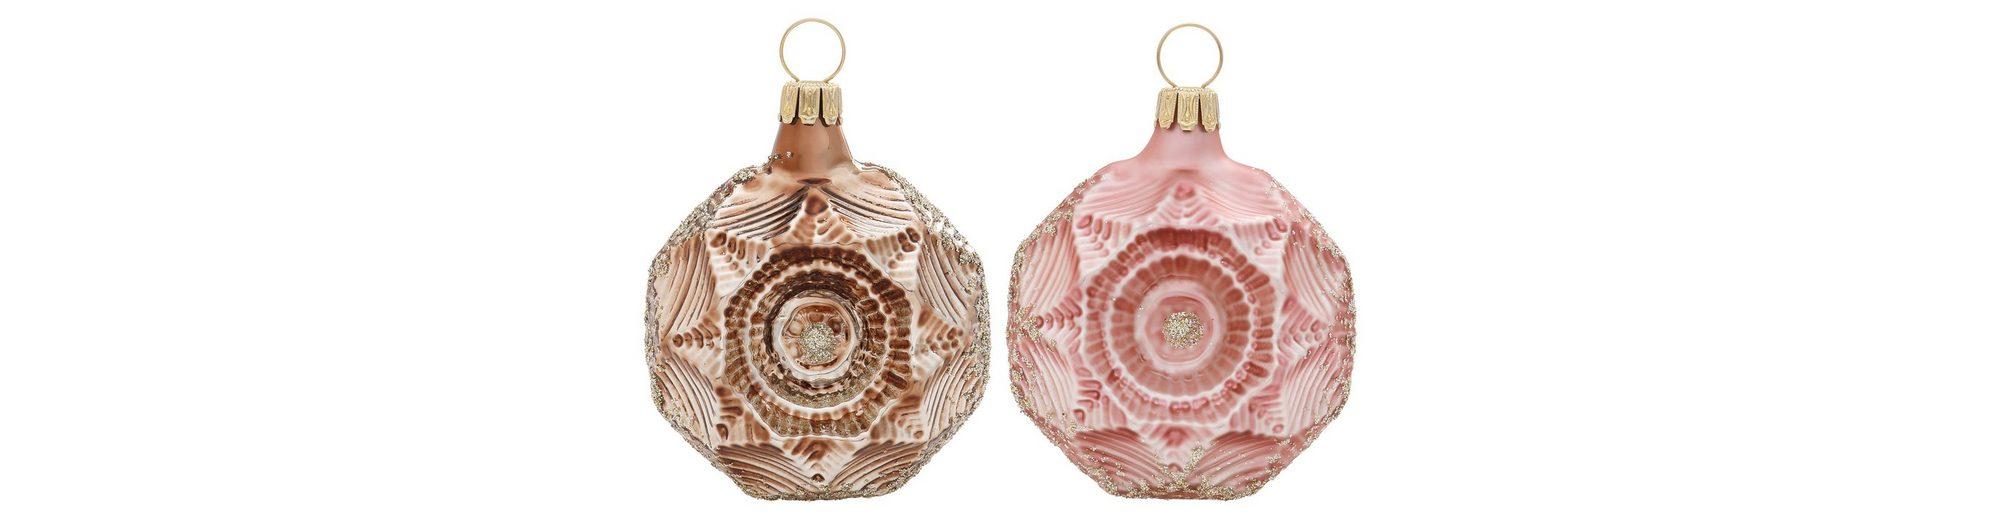 Thüringer Glasdesign TGS-Christbaumschmuck Medaillons, Made in Germany, »Romantik« (6tlg.)